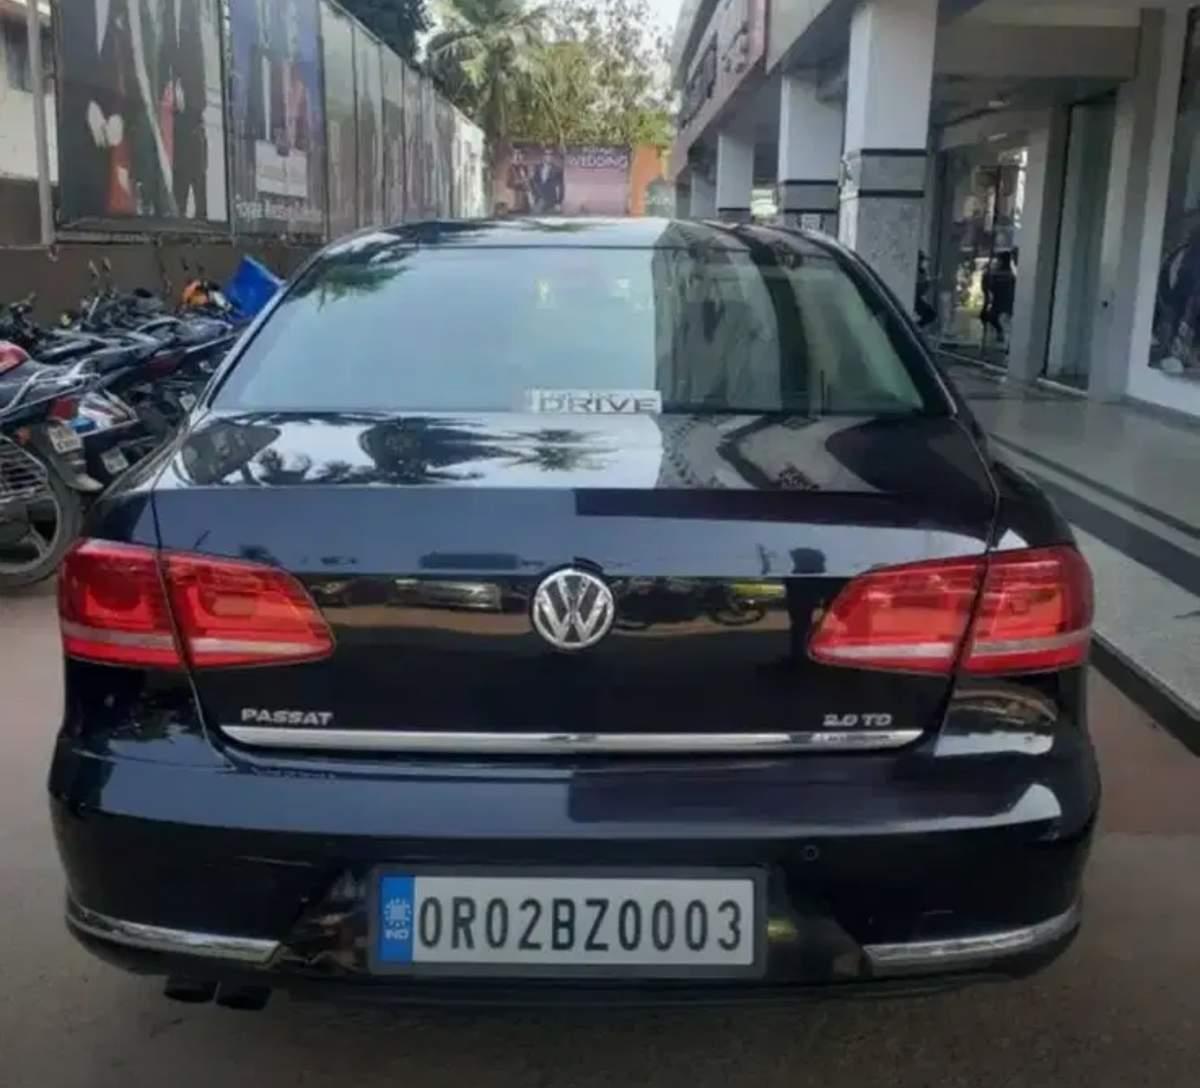 Volkswagen Passat Rear Left Side Angle View